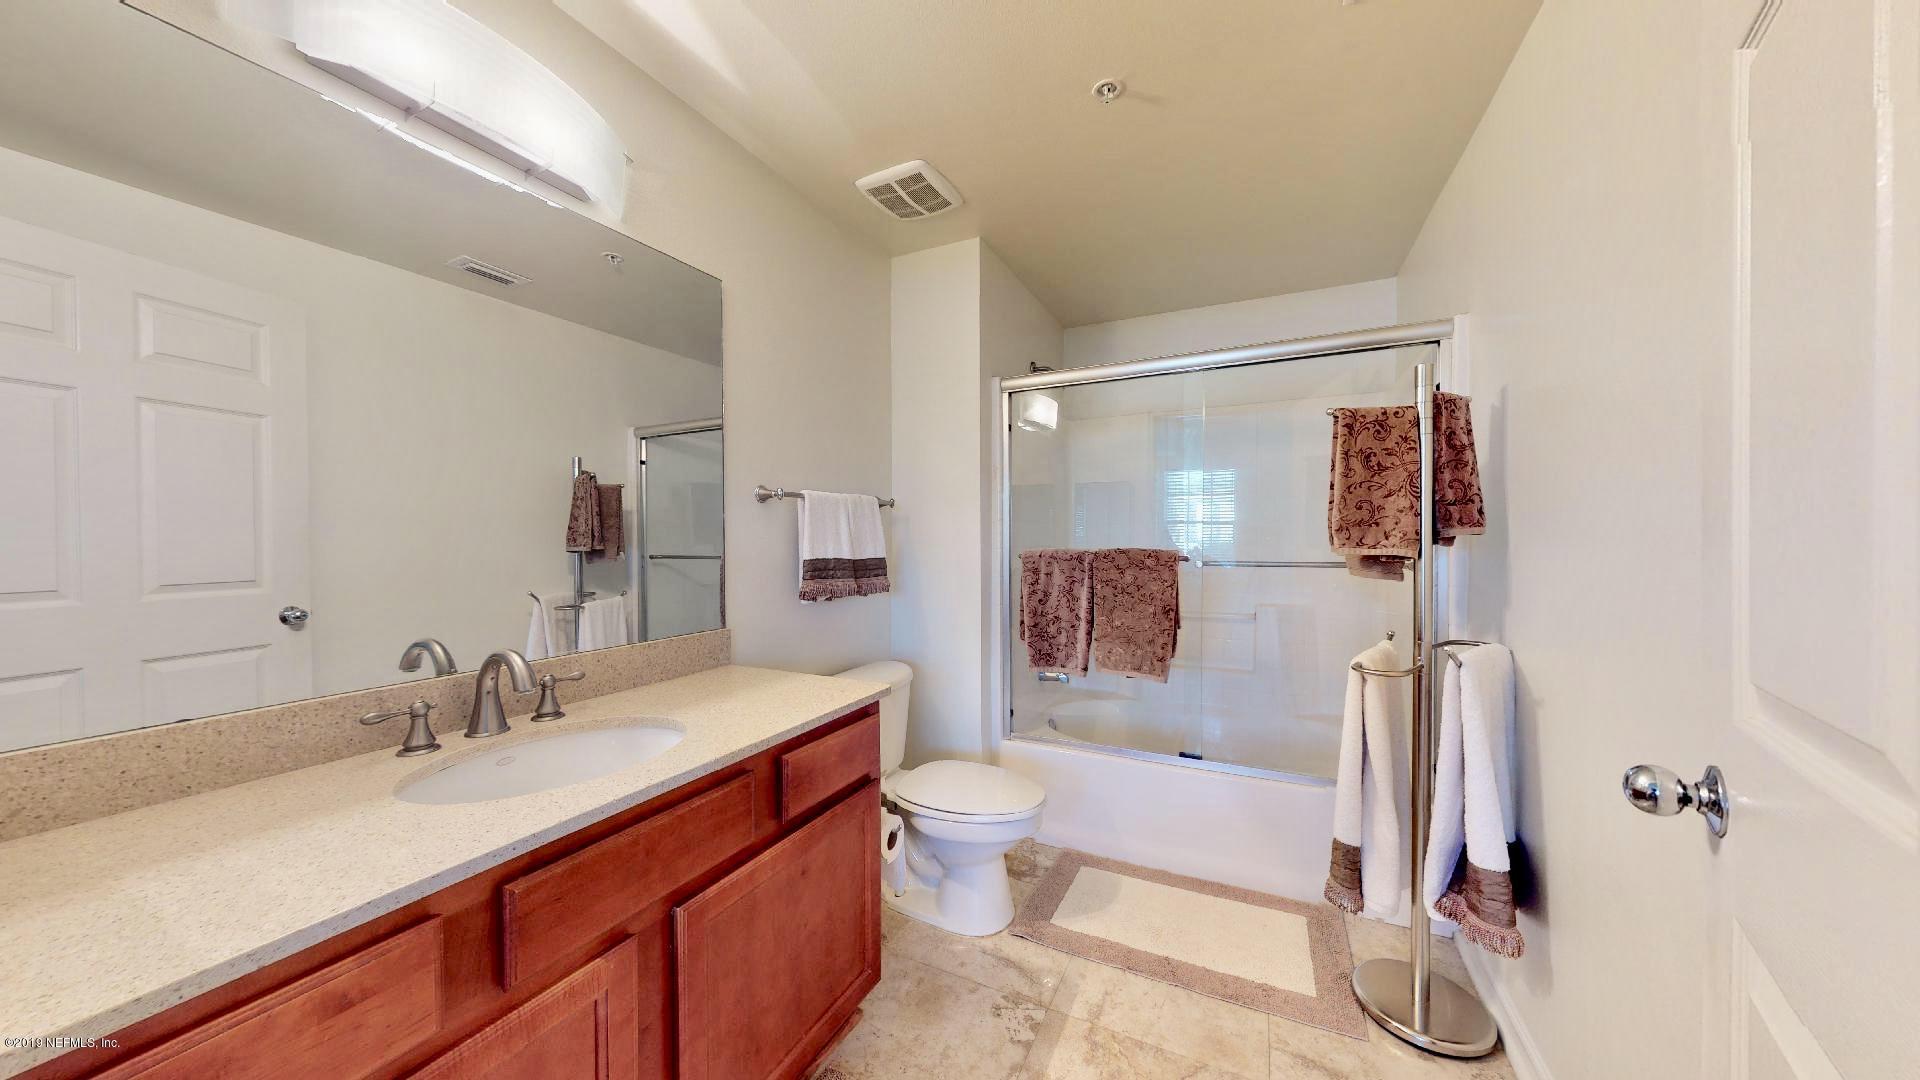 1005 BELLA VISTA, ST AUGUSTINE, FLORIDA 32084, 3 Bedrooms Bedrooms, ,2 BathroomsBathrooms,Condo,For sale,BELLA VISTA,1018775